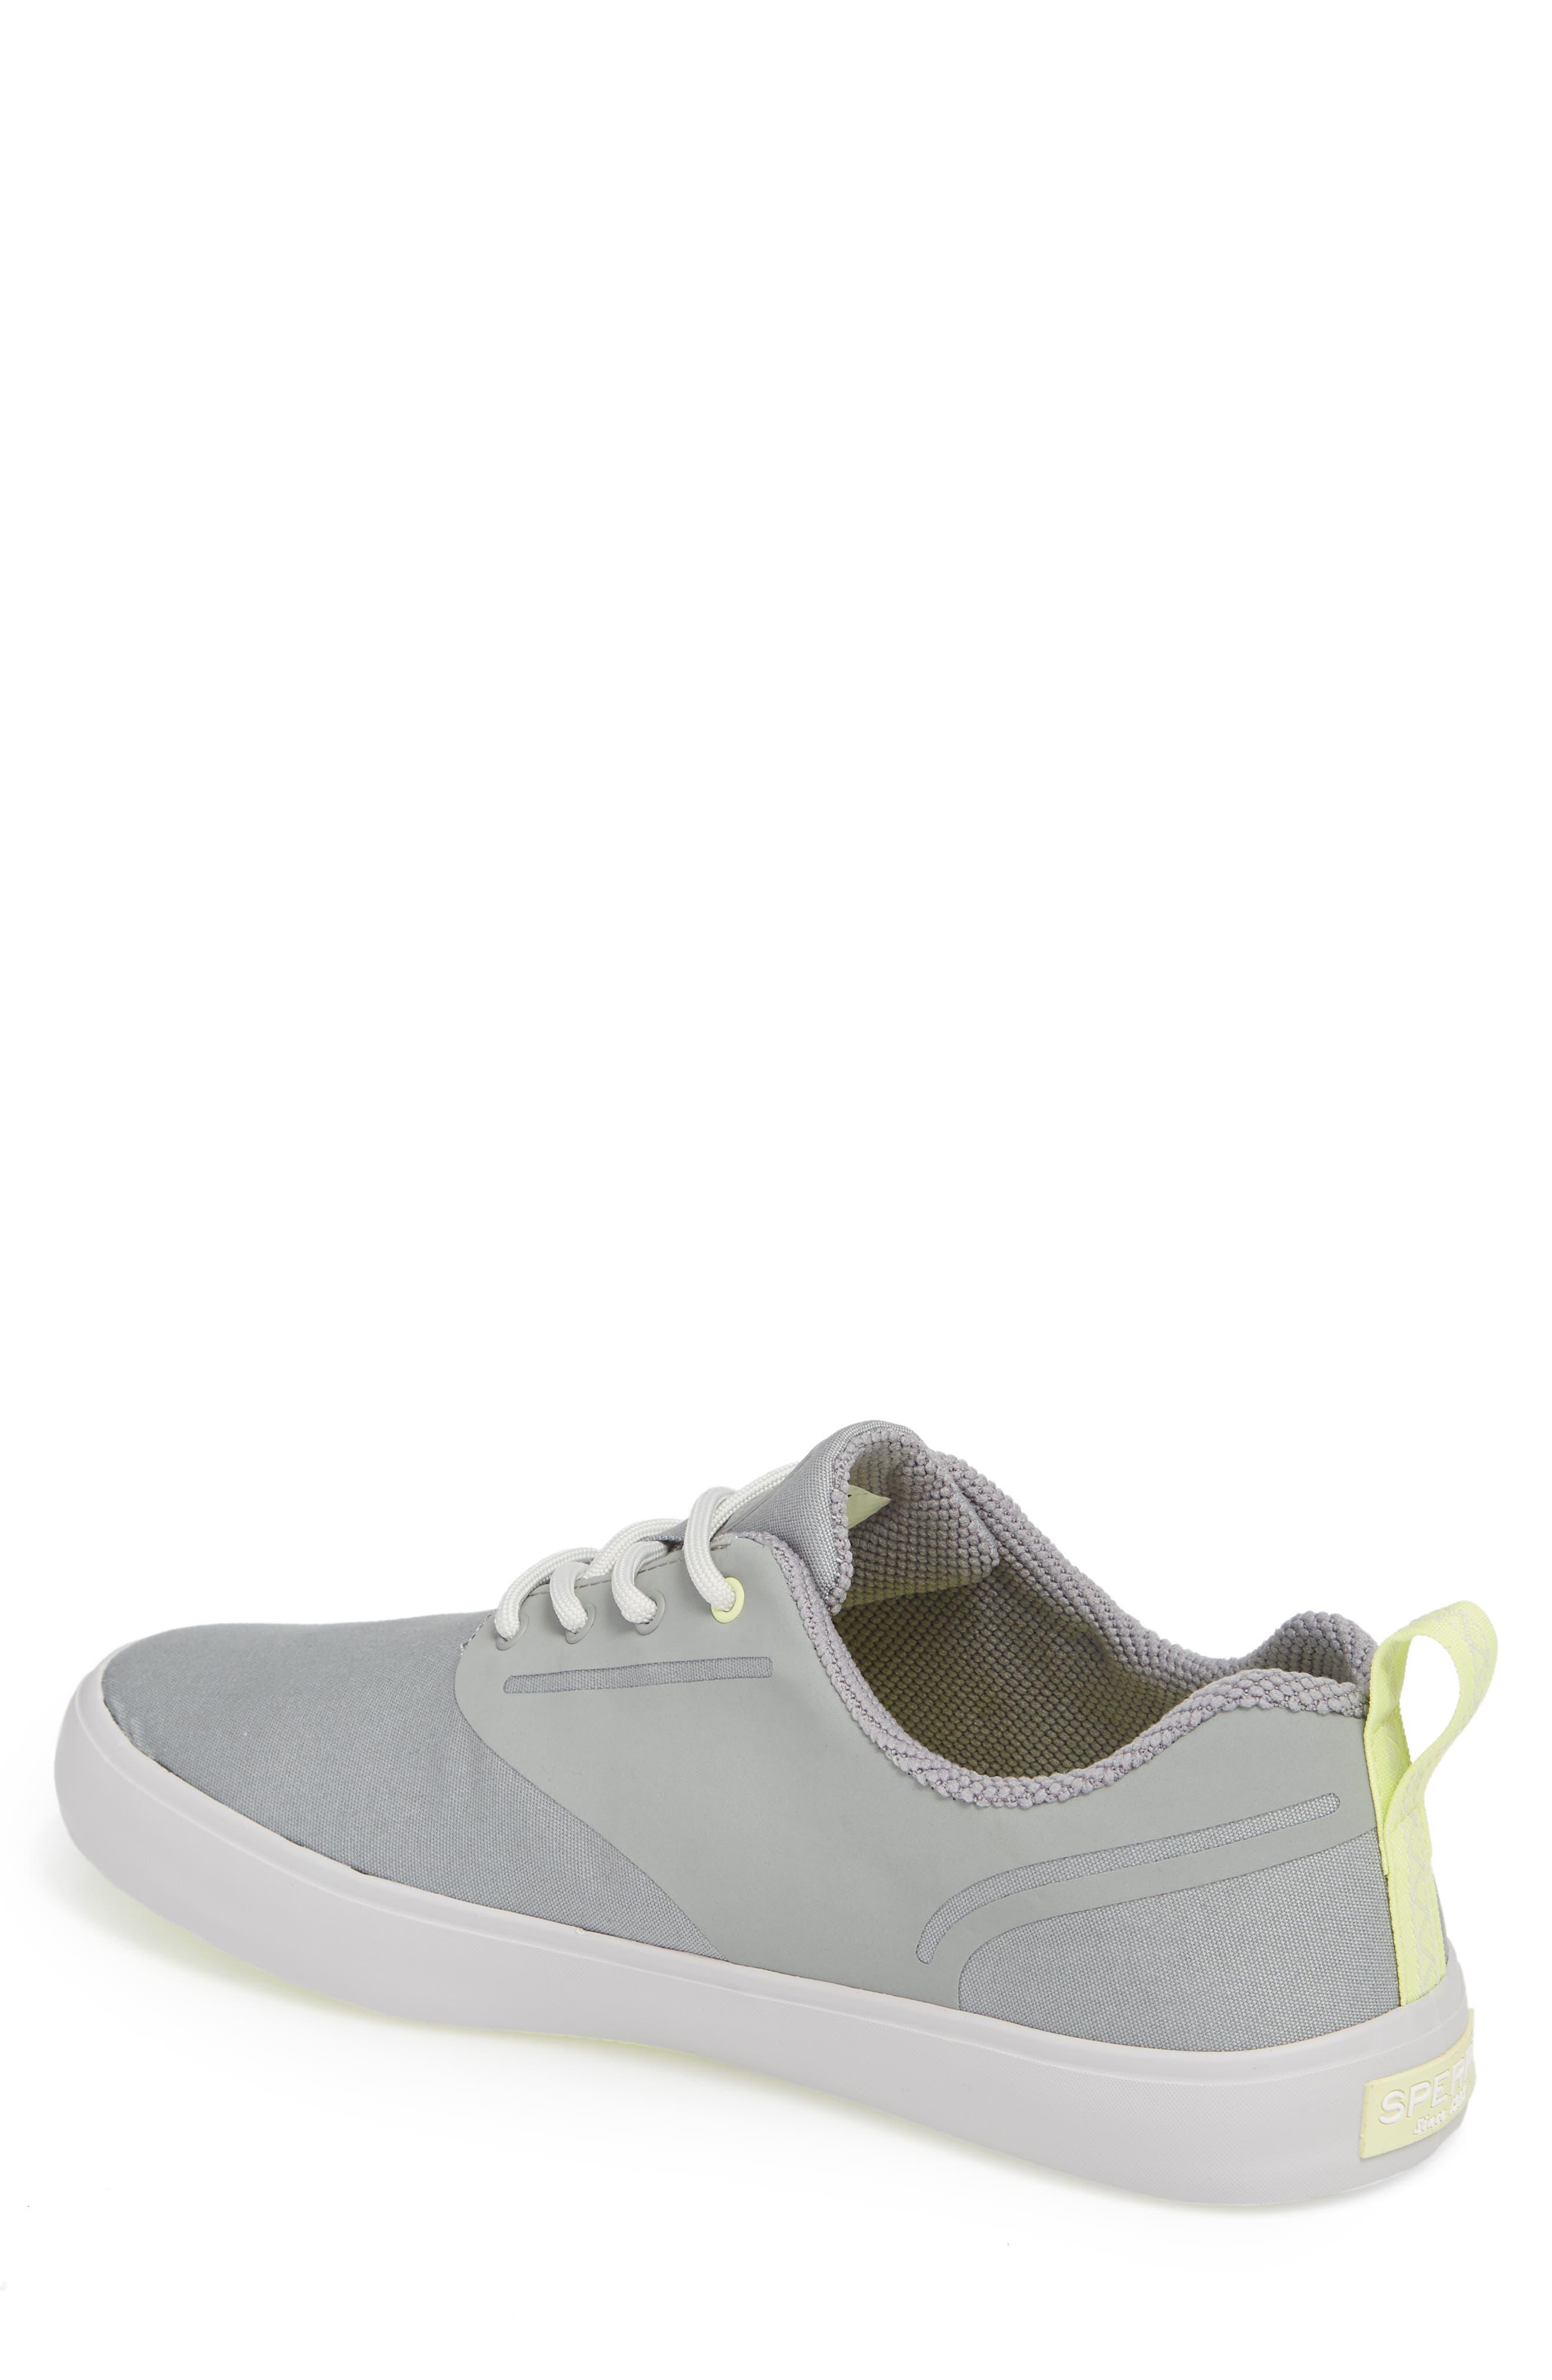 Flex Deck CVO Sneaker,                             Alternate thumbnail 2, color,                             GREY